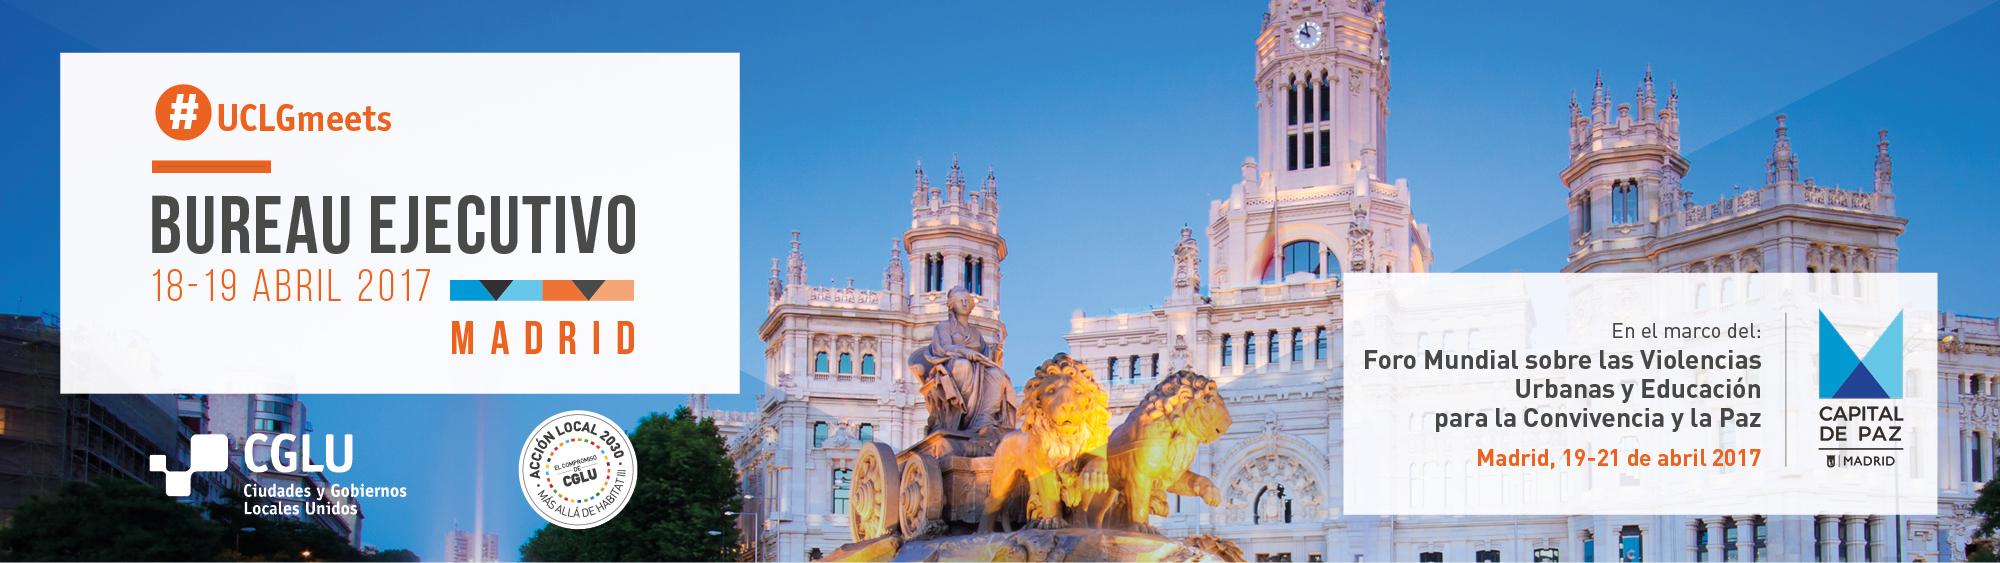 Madrid 2017 - Bureau Ejecutivo